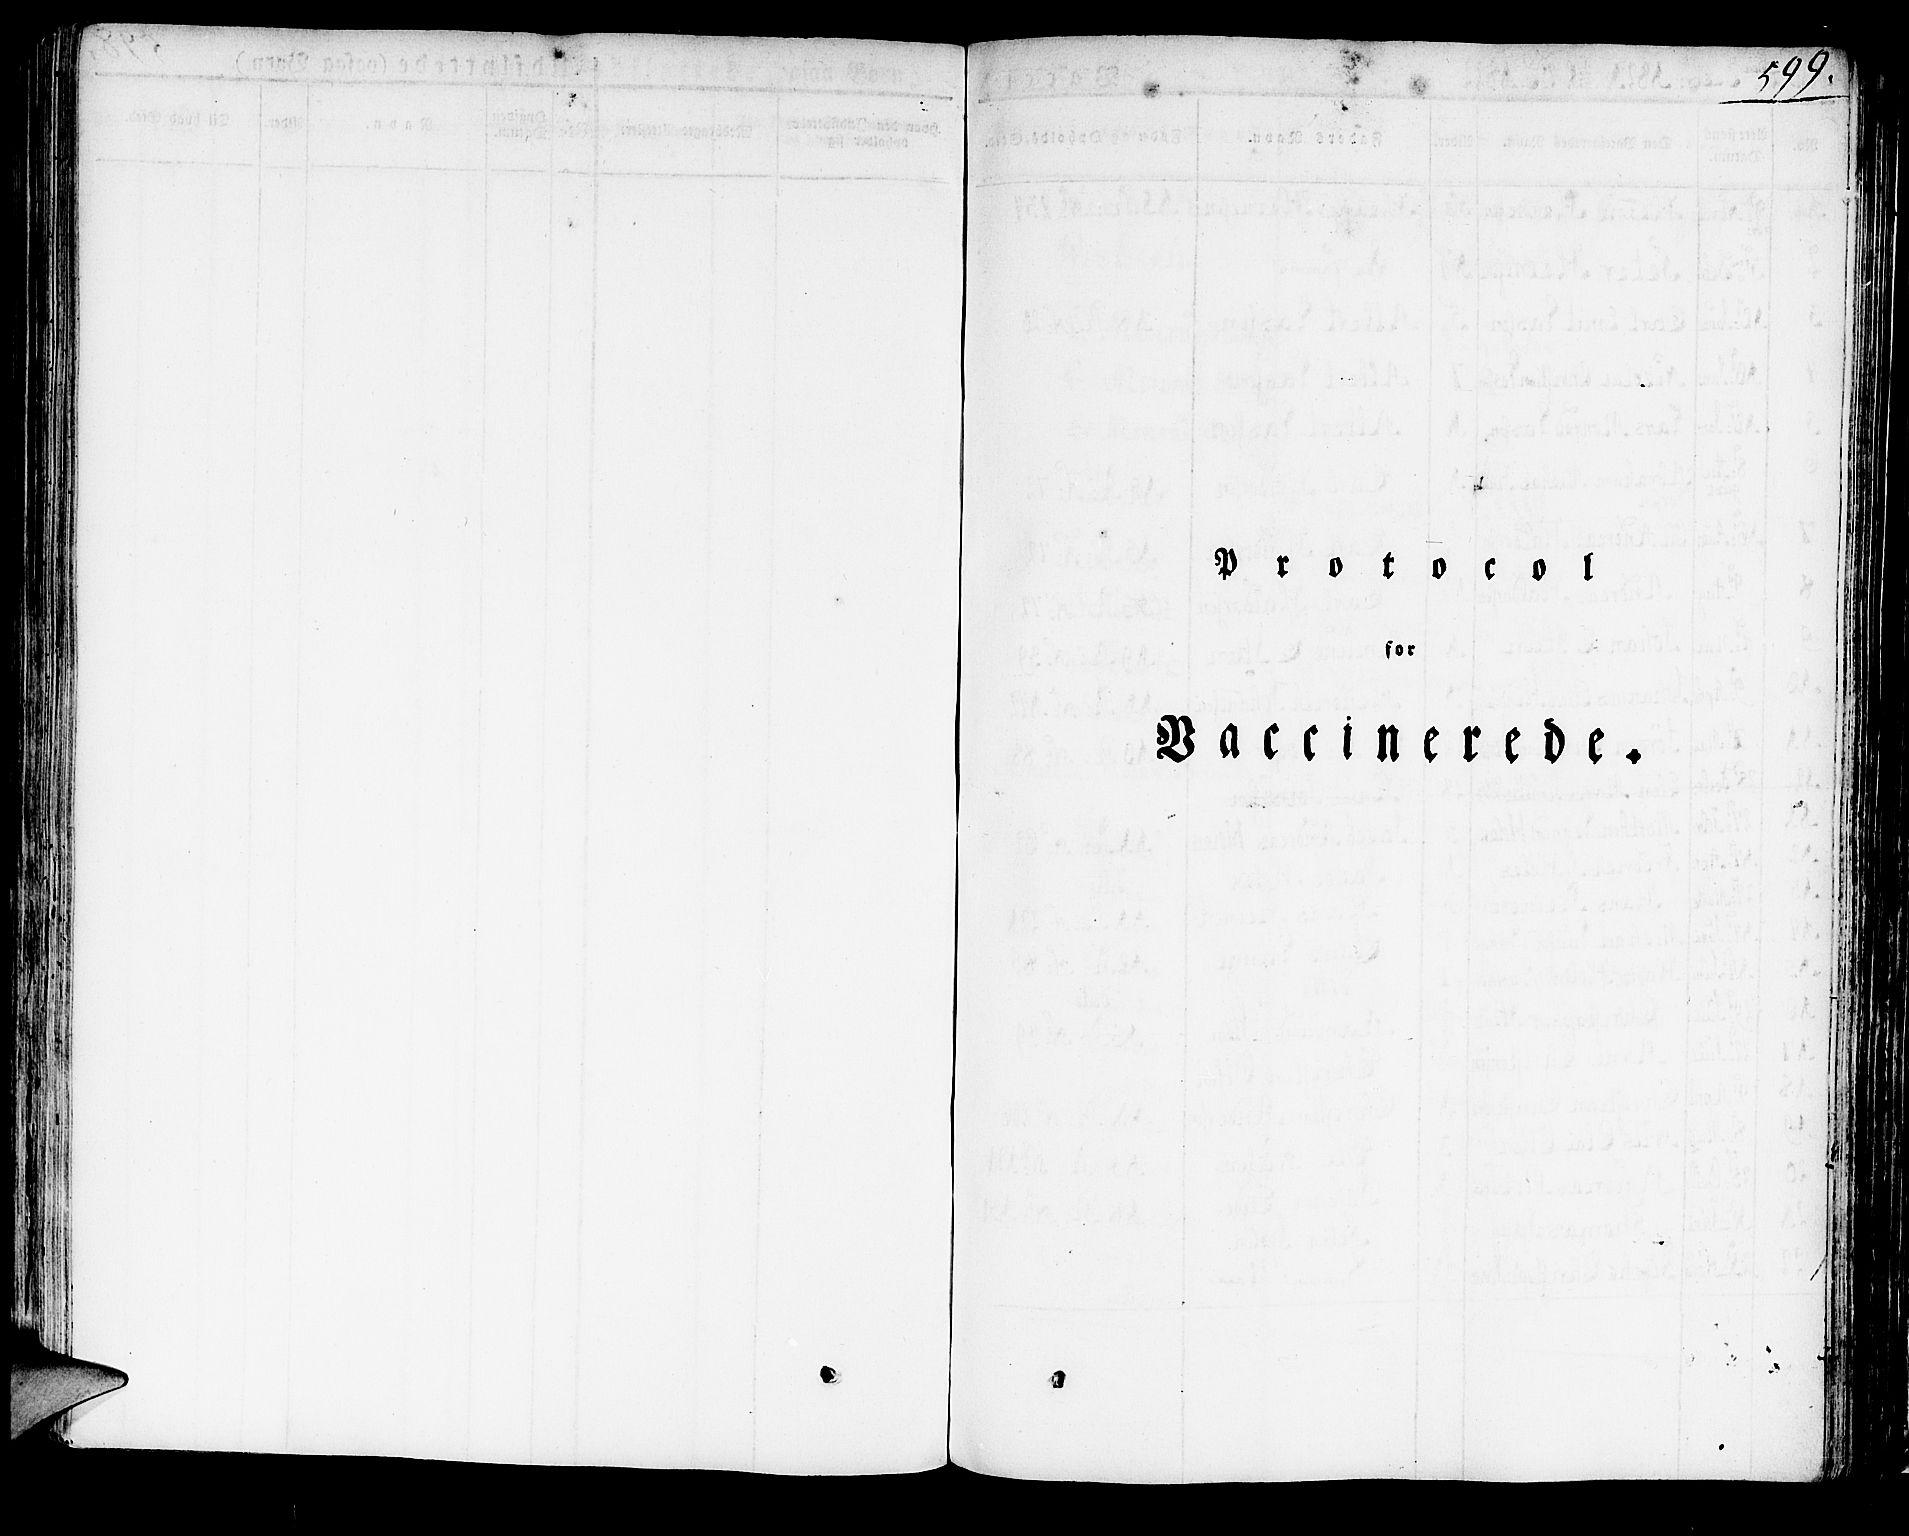 SAB, Domkirken Sokneprestembete, H/Haa/L0012: Ministerialbok nr. A 12, 1821-1840, s. 599